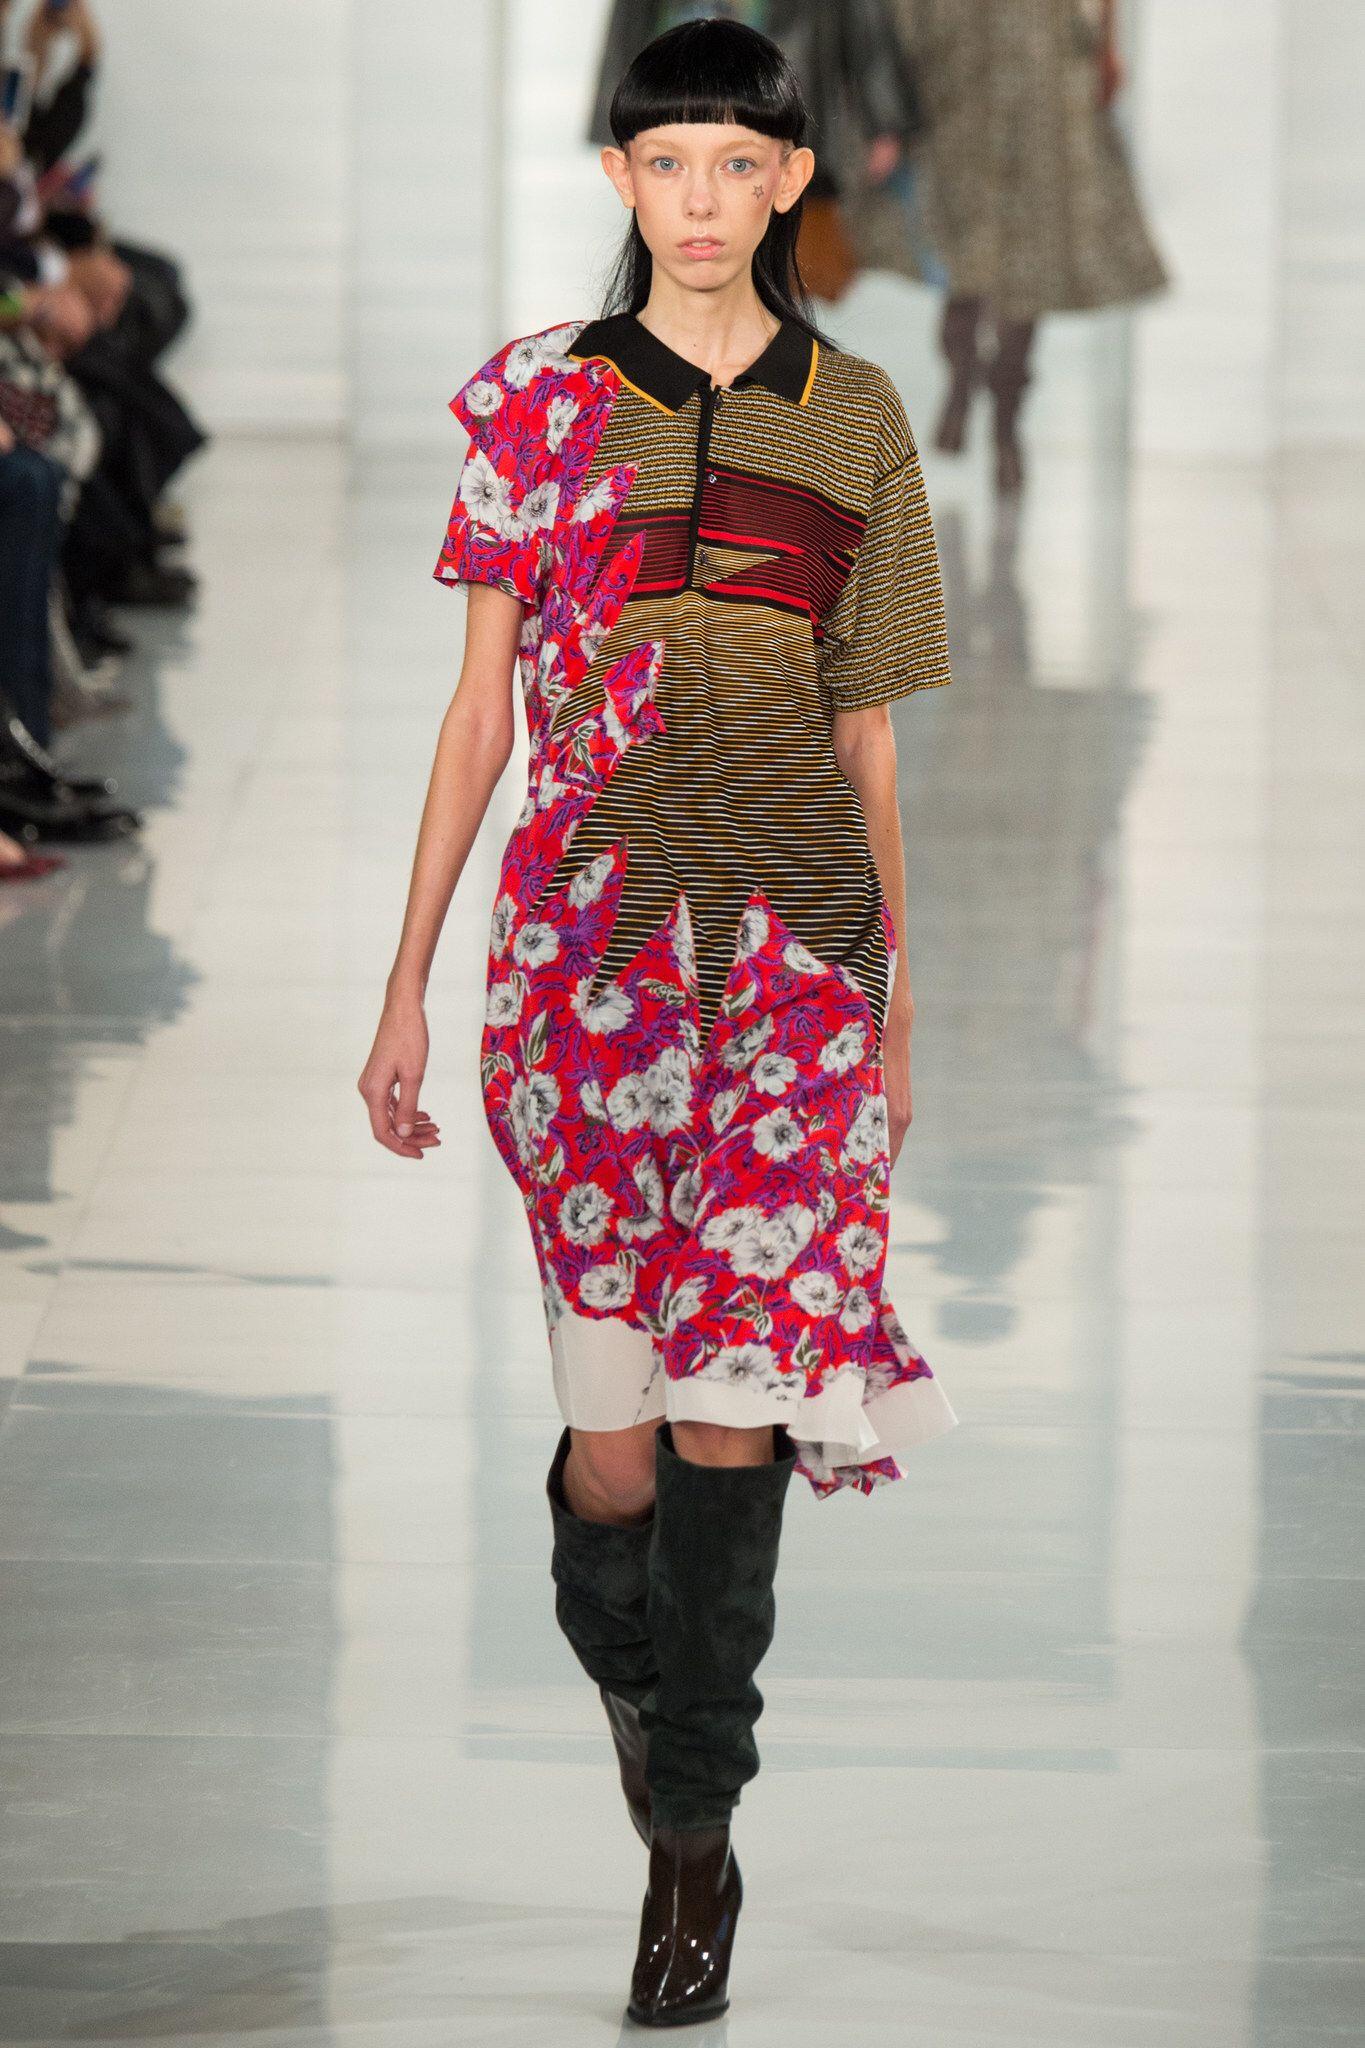 Maison Margiela Spring Couture 2016